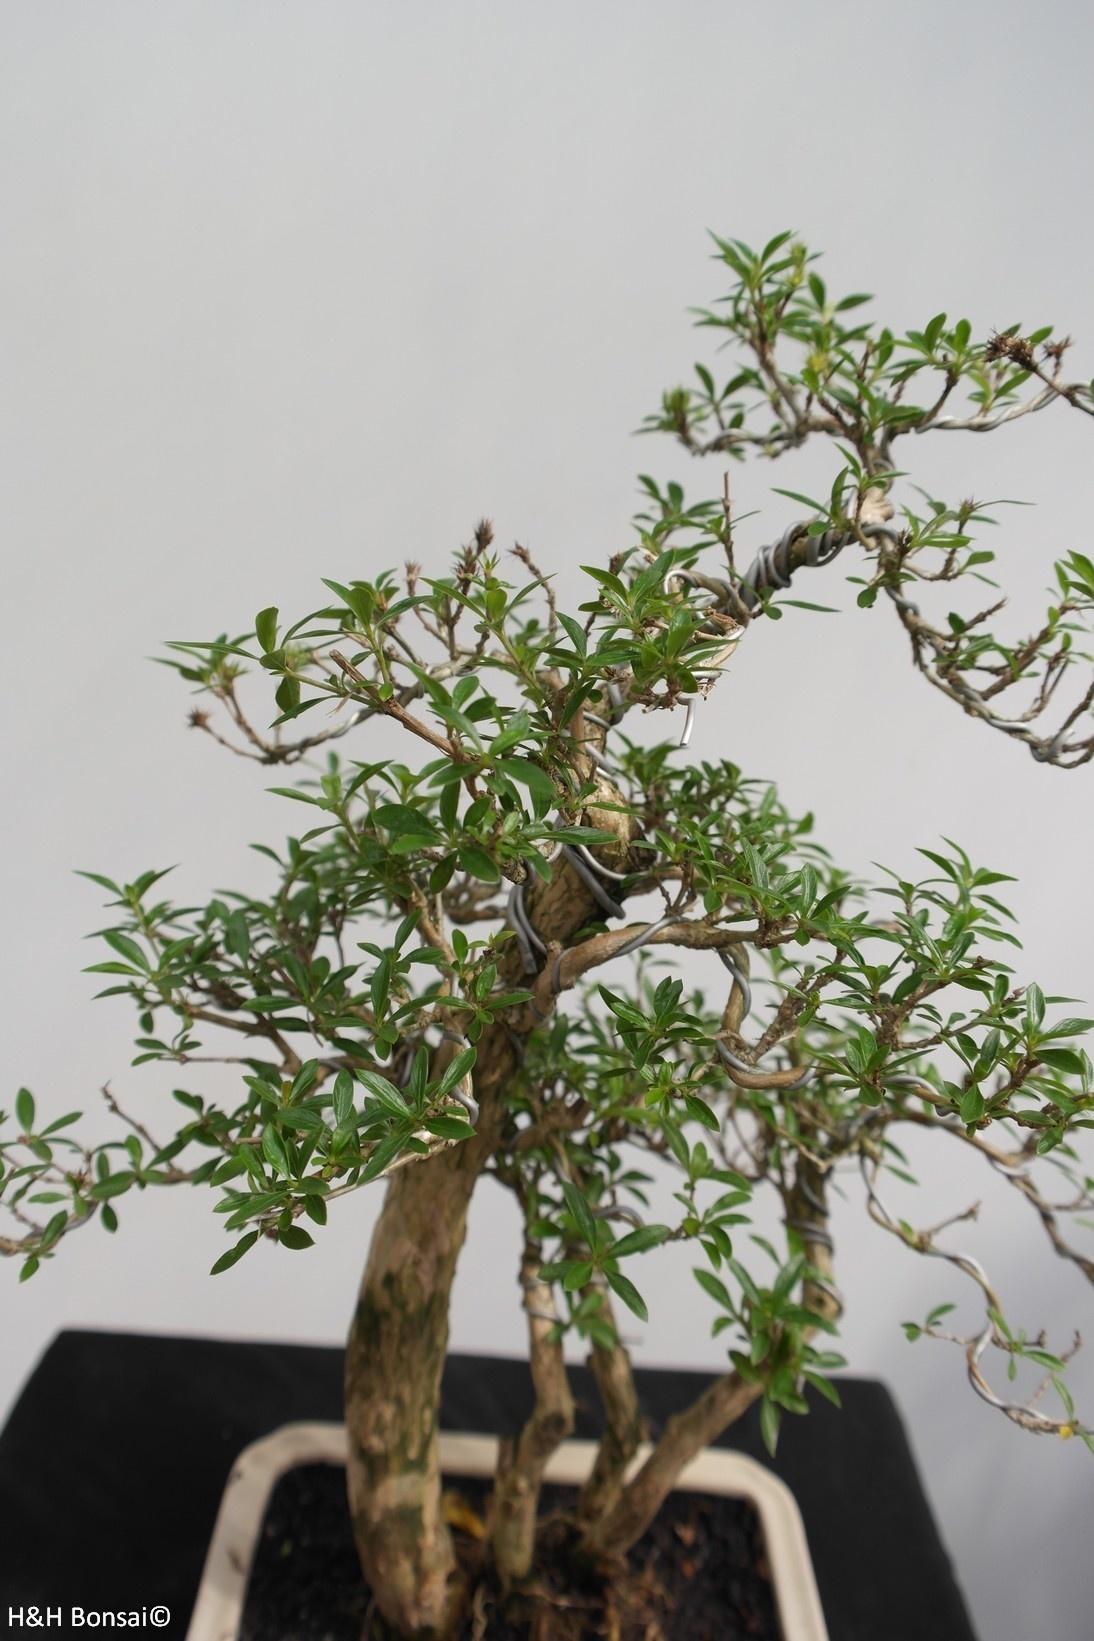 Bonsai Neige de juin, Serissa foetida, no. 7861